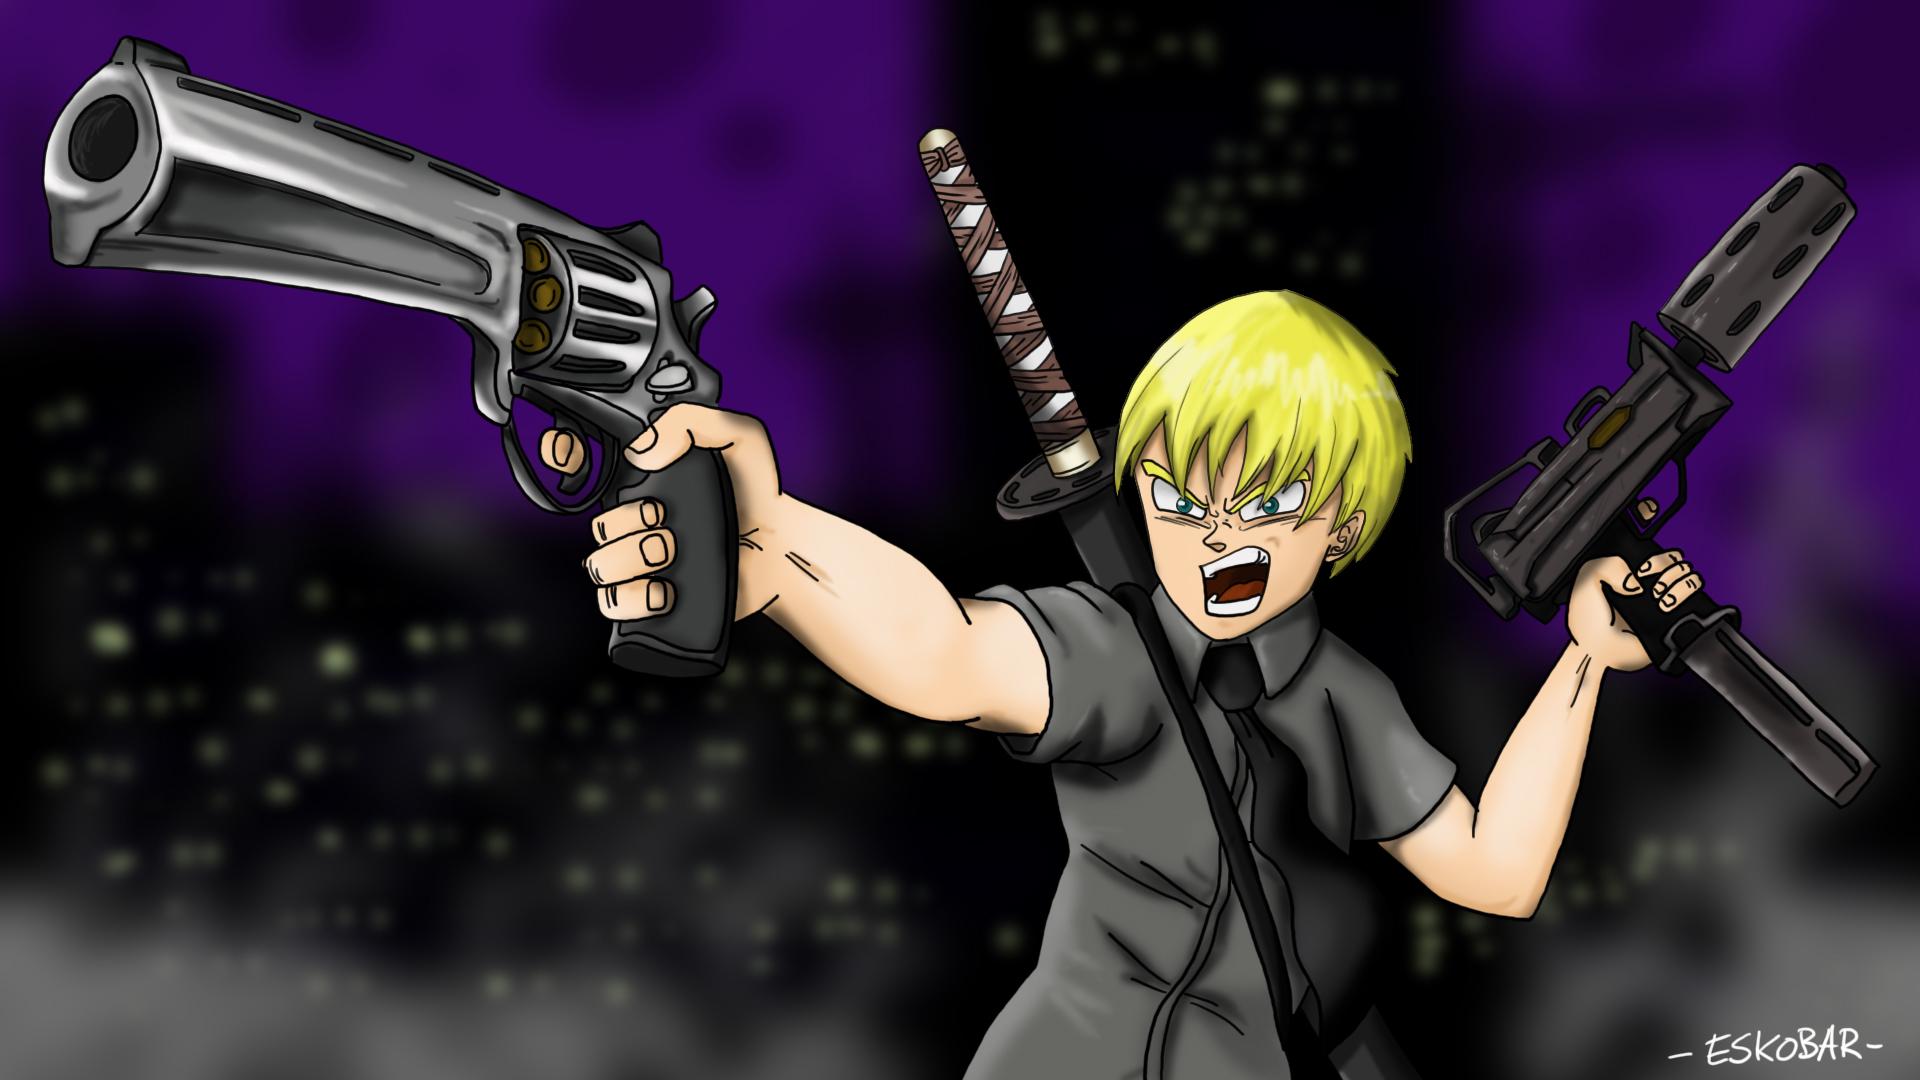 AnimeBoy Katana Wallpaper by artwork-eskobar on DeviantArt